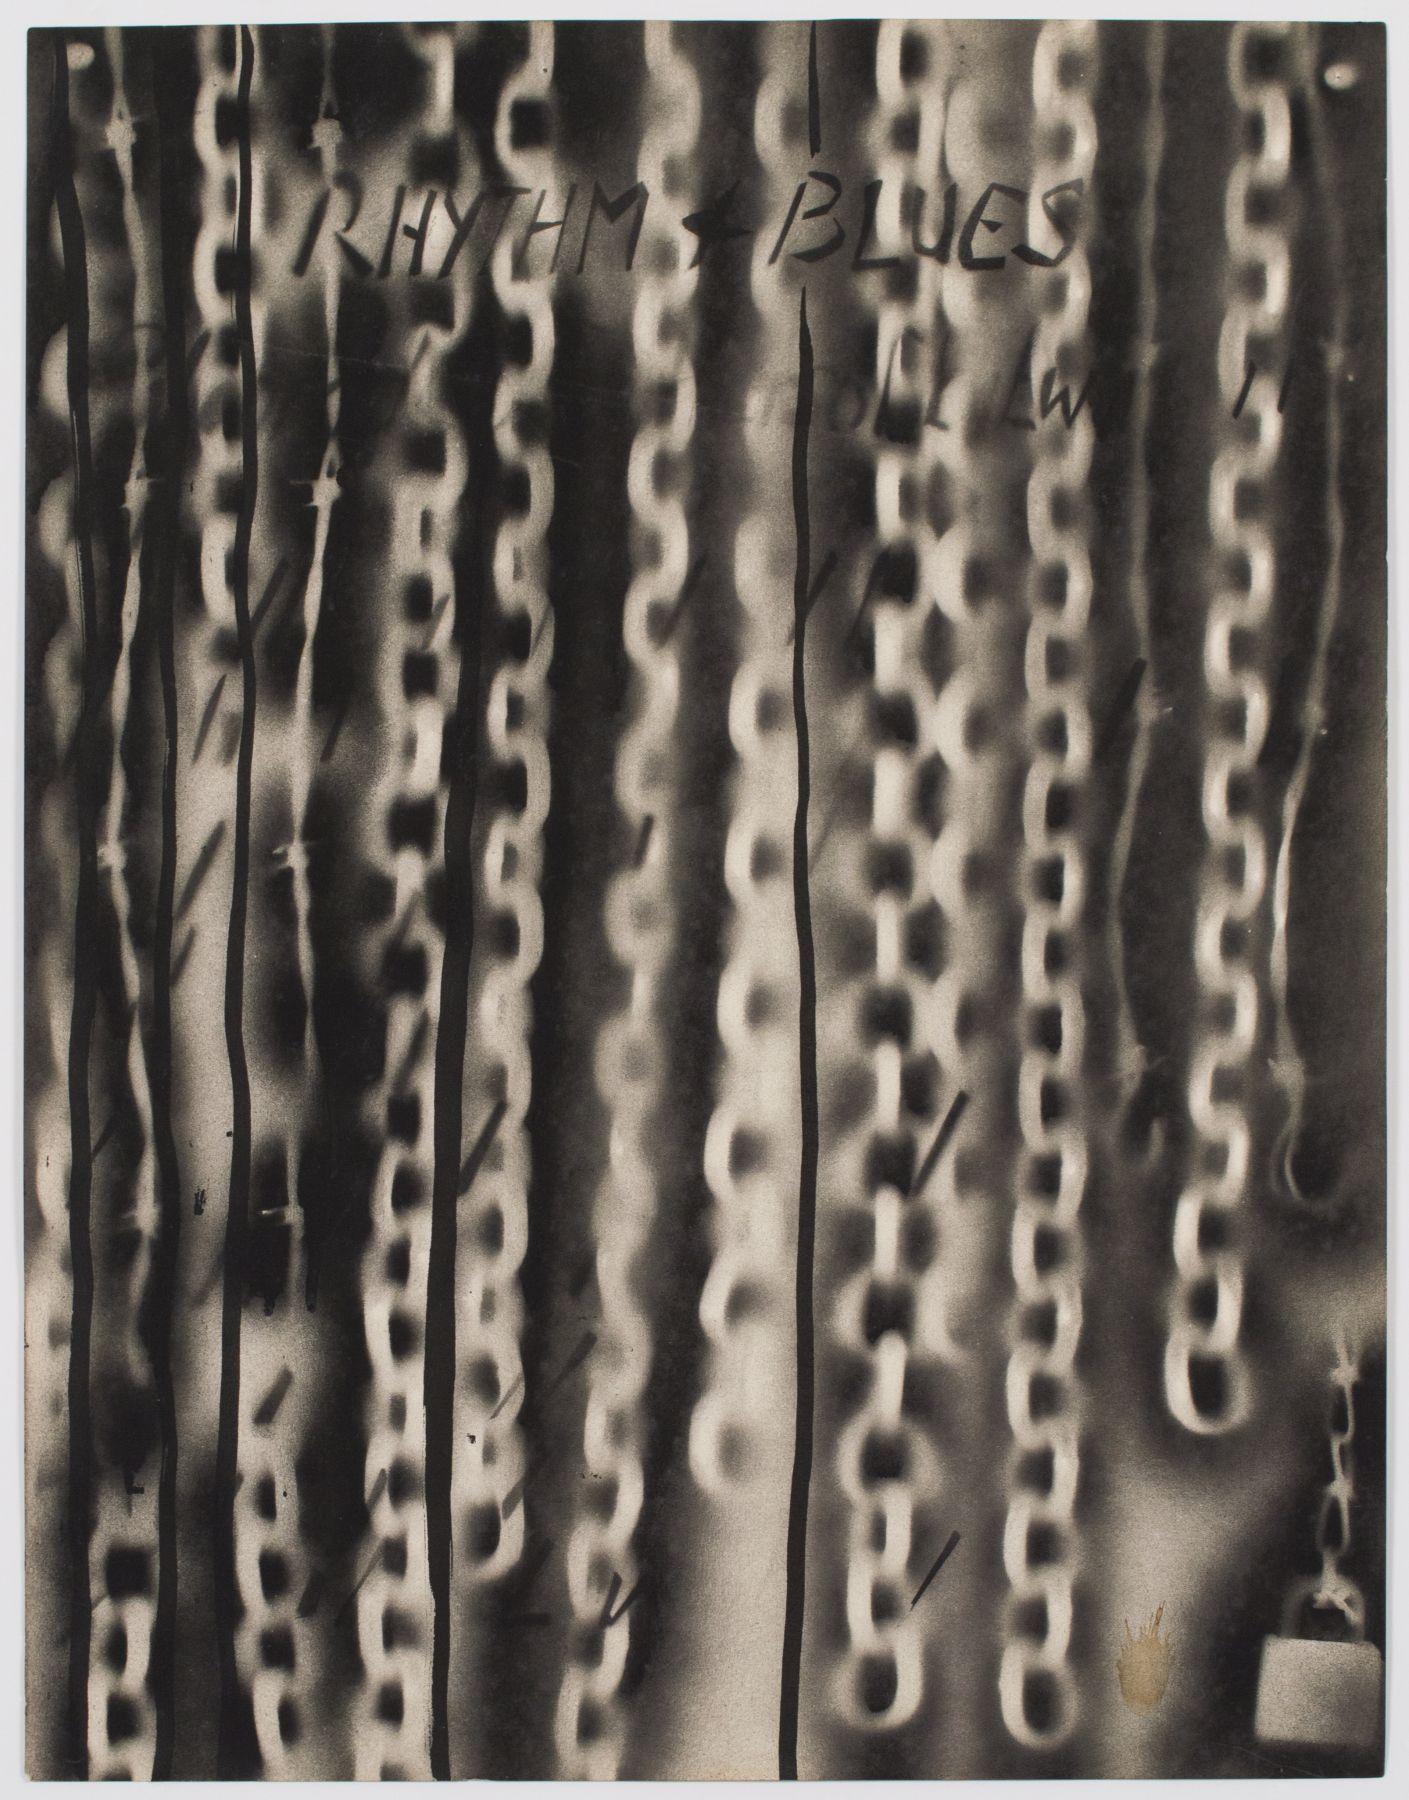 Melvin Edwards, Rhythm and Blues, c. 1975